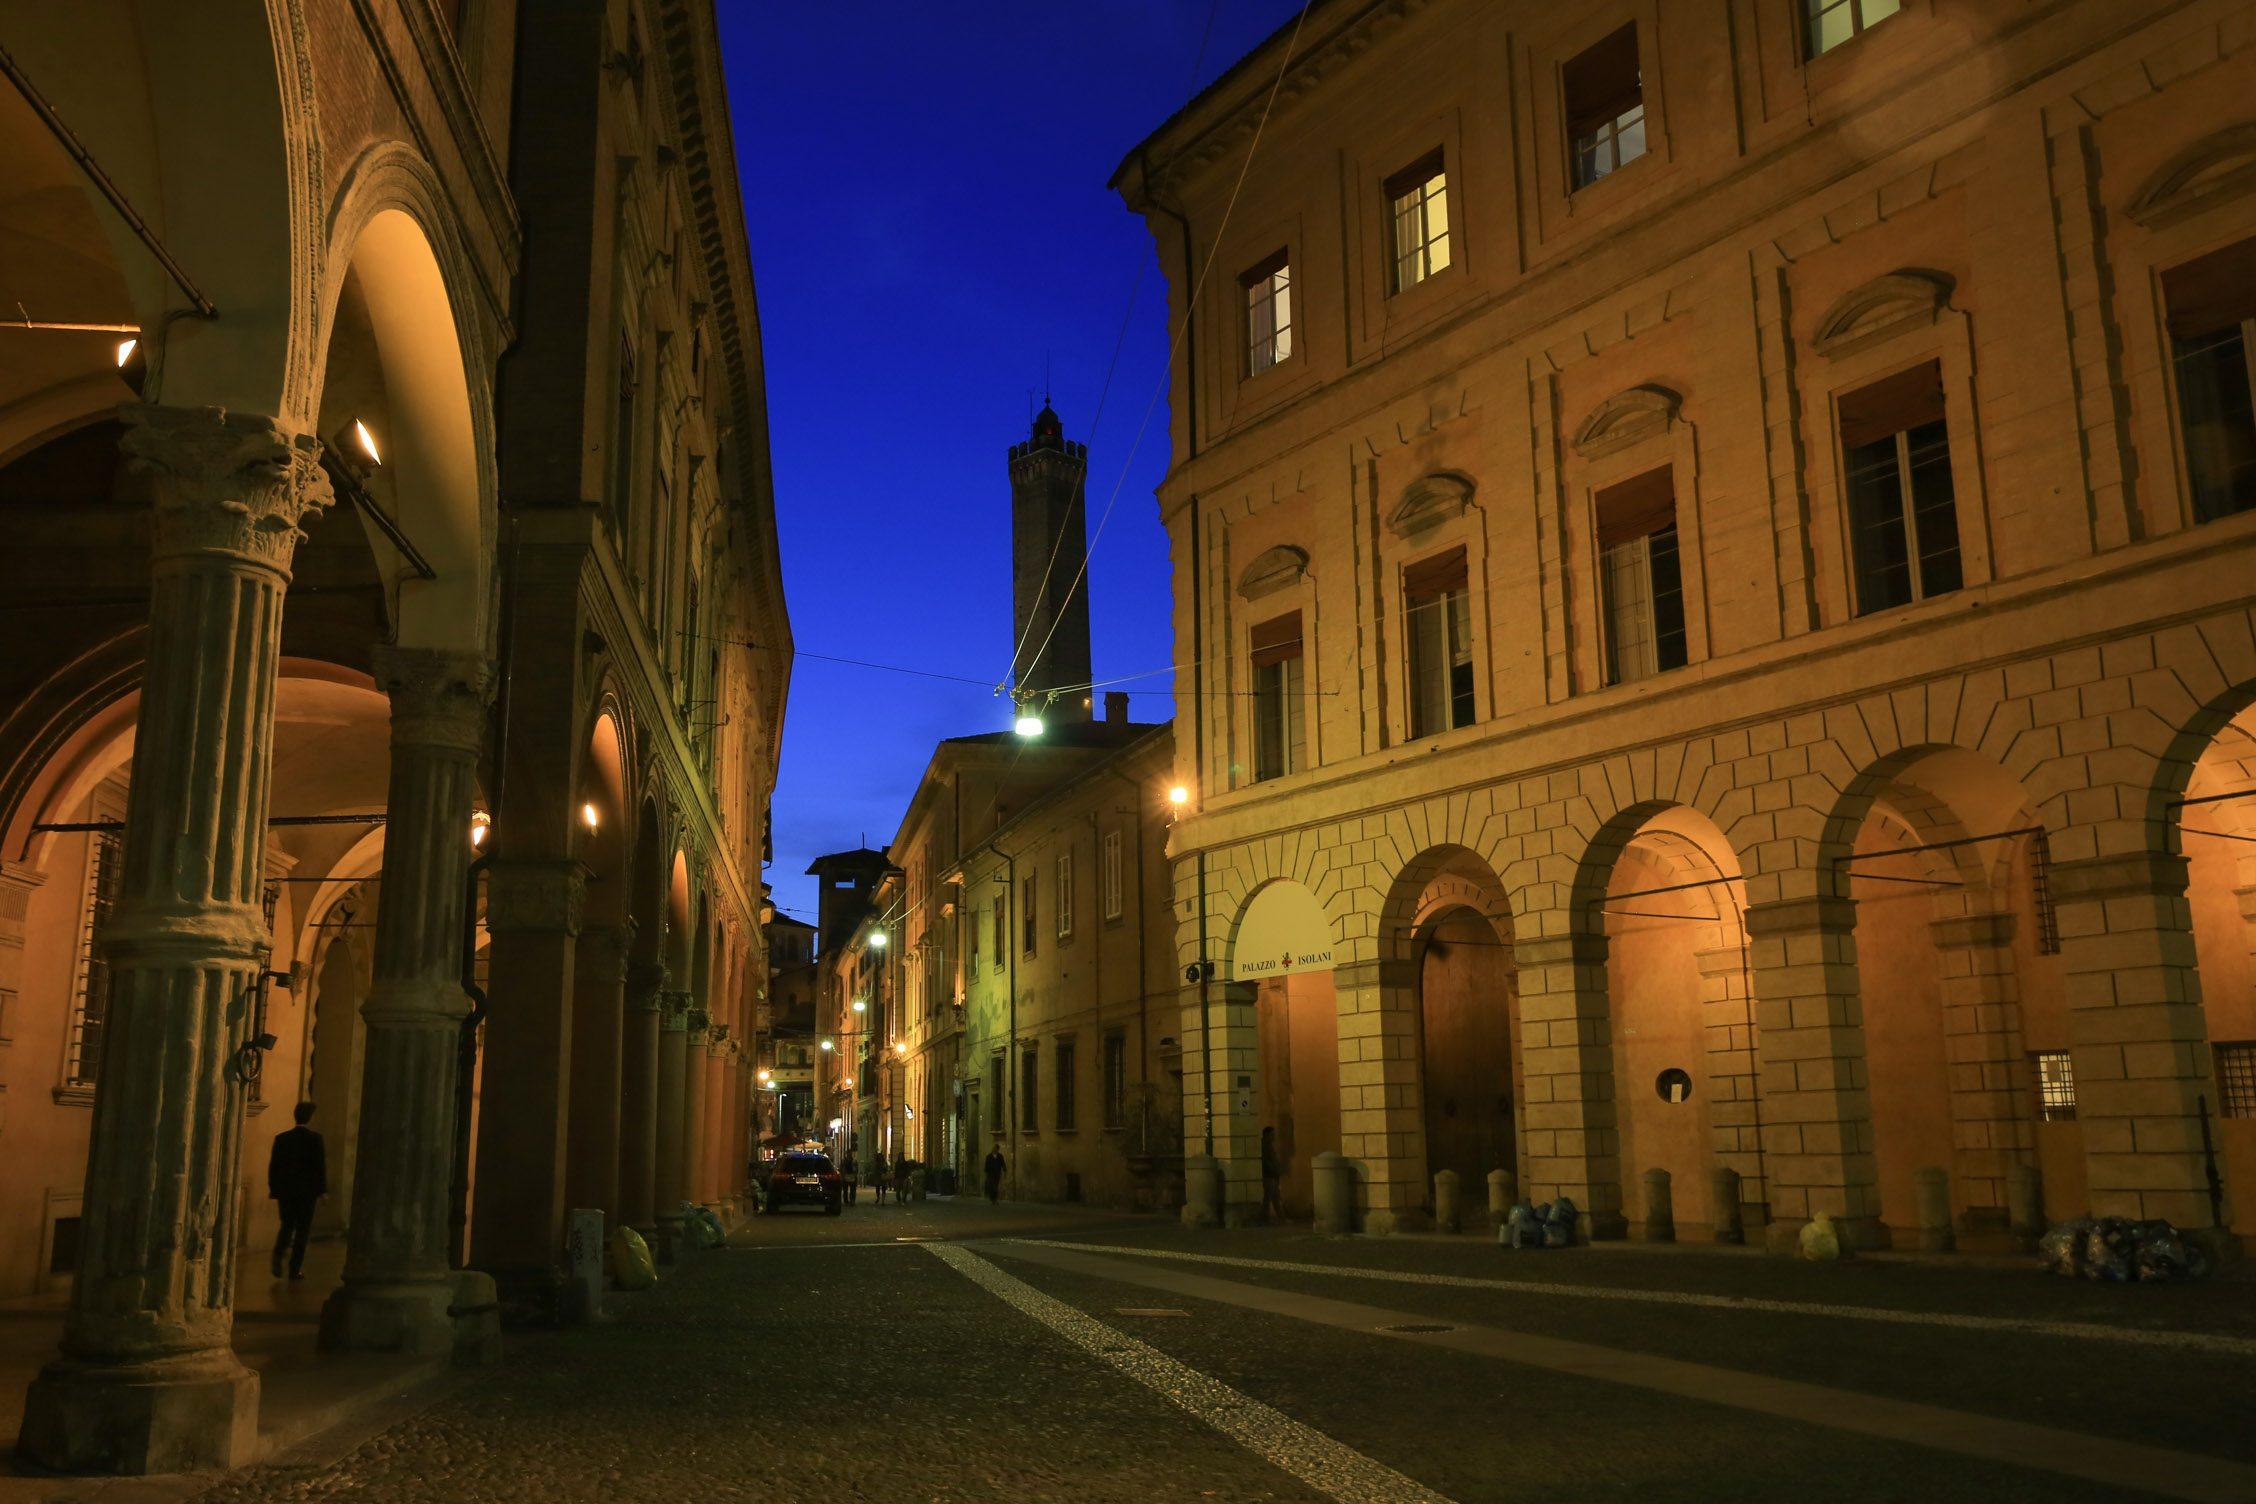 de andere kant van Piazza San Stefano